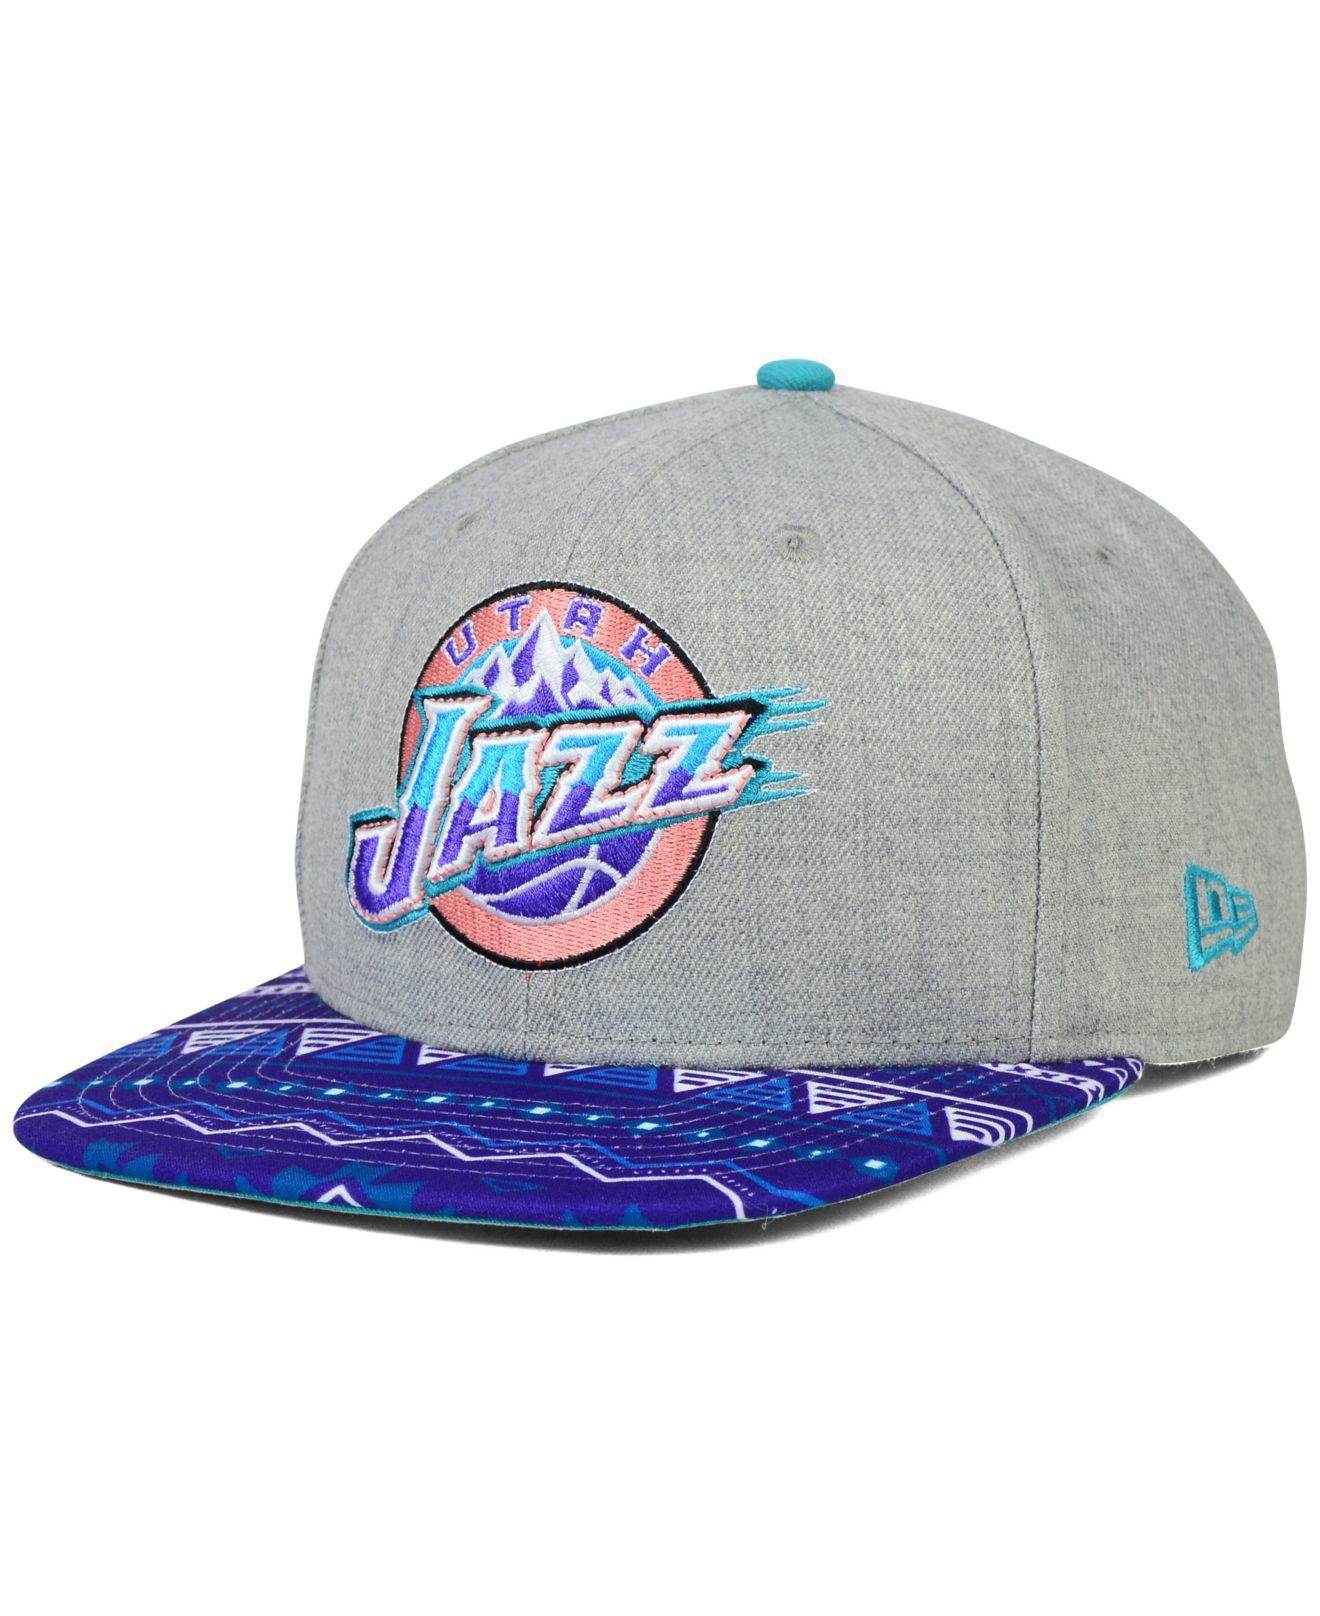 Lyst - KTZ Utah Jazz Neon Mashup 9fifty Snapback Cap in Blue for Men e04ac53cc